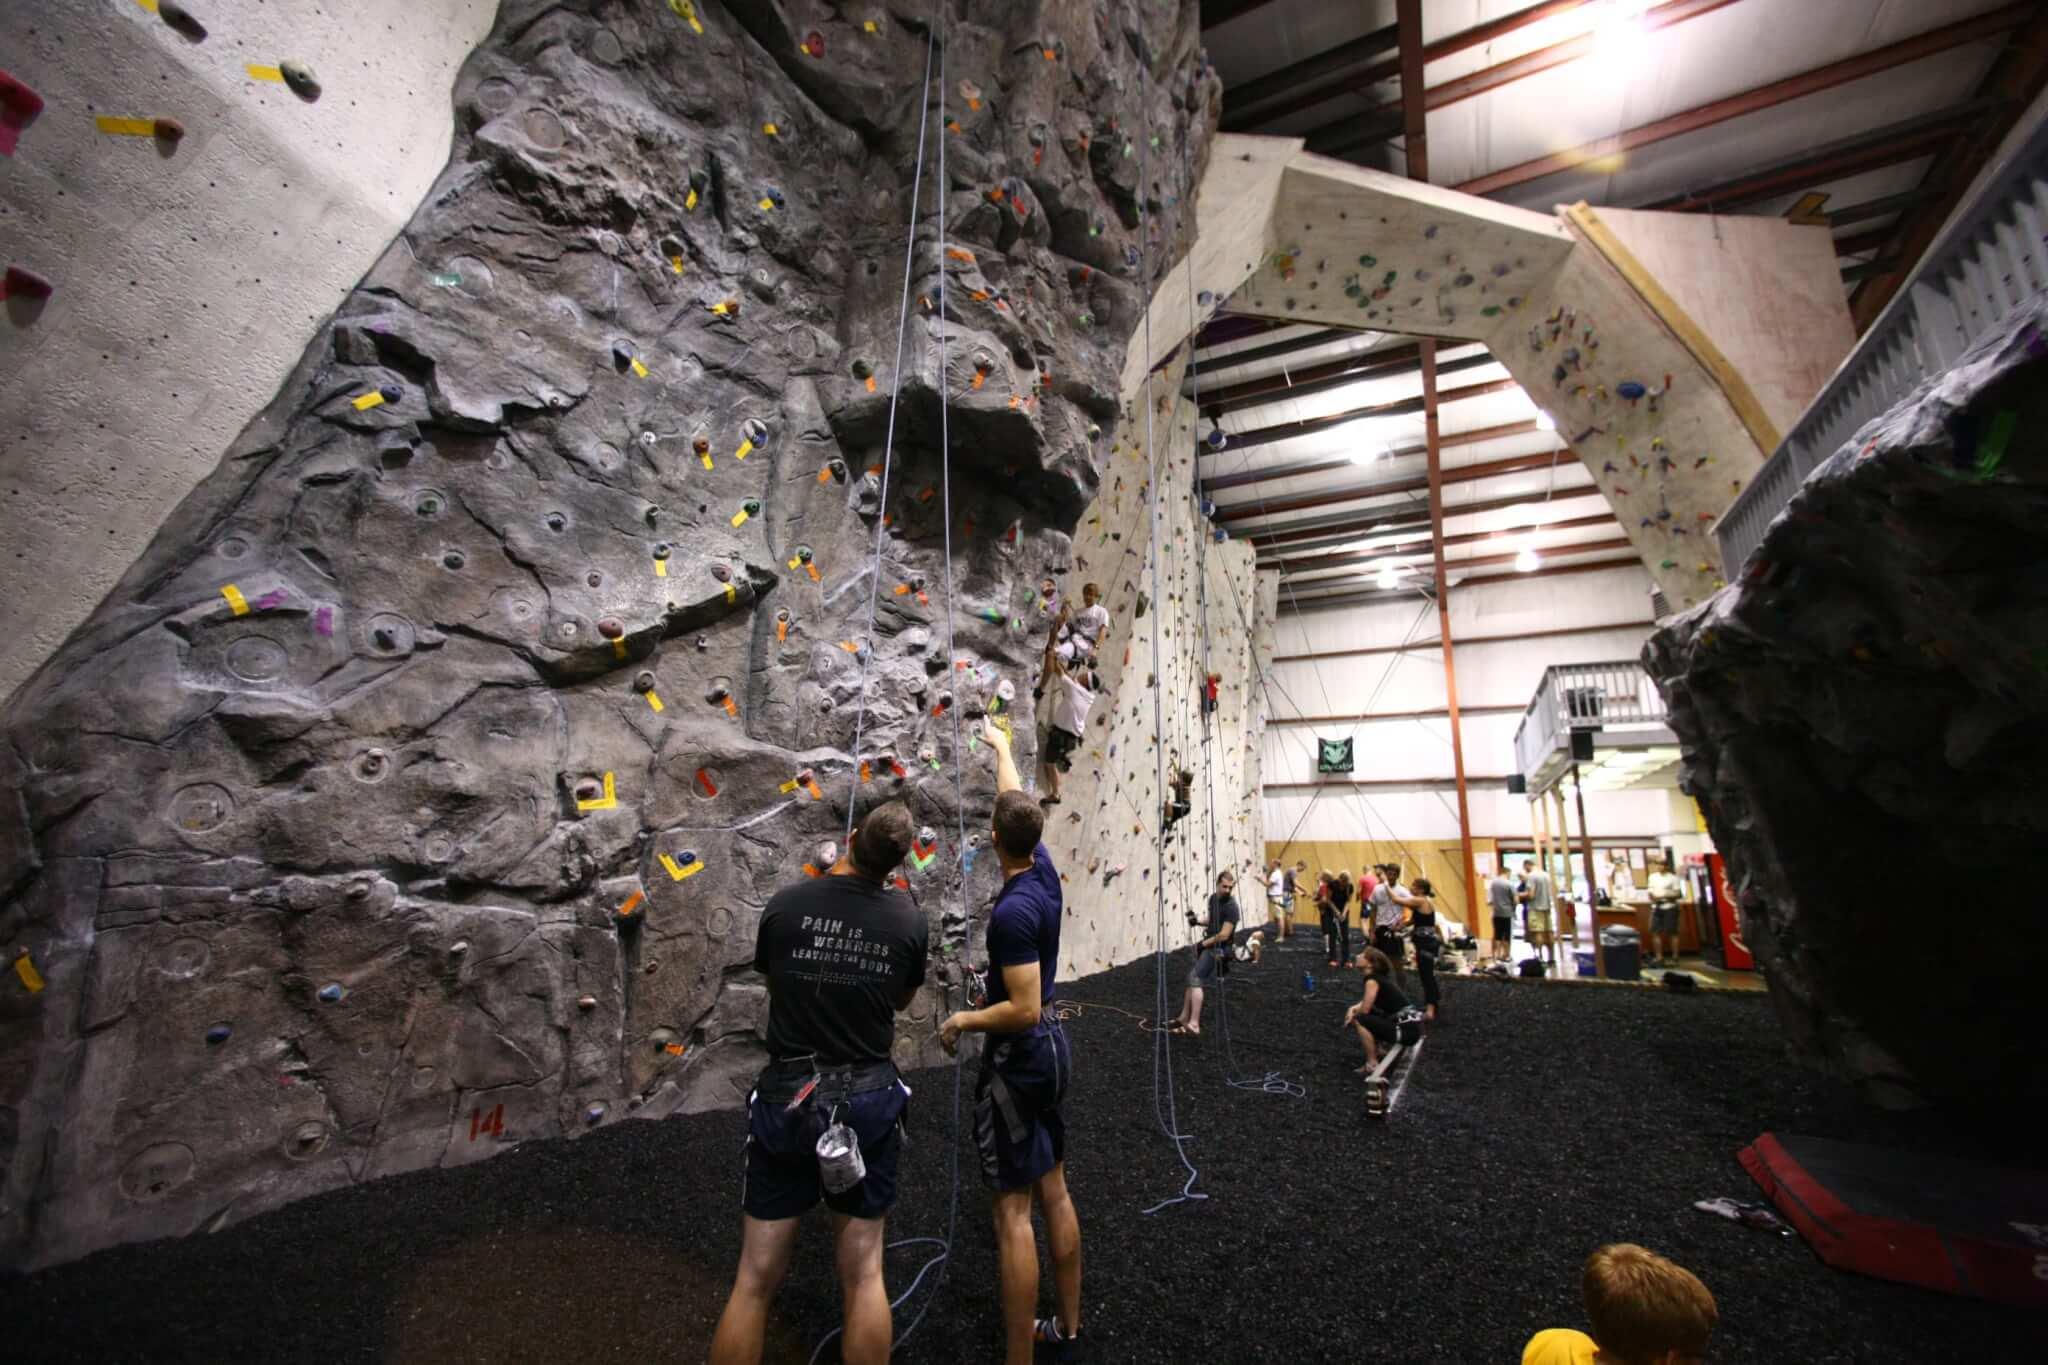 Indoor bouldering at Kendall Cliffs